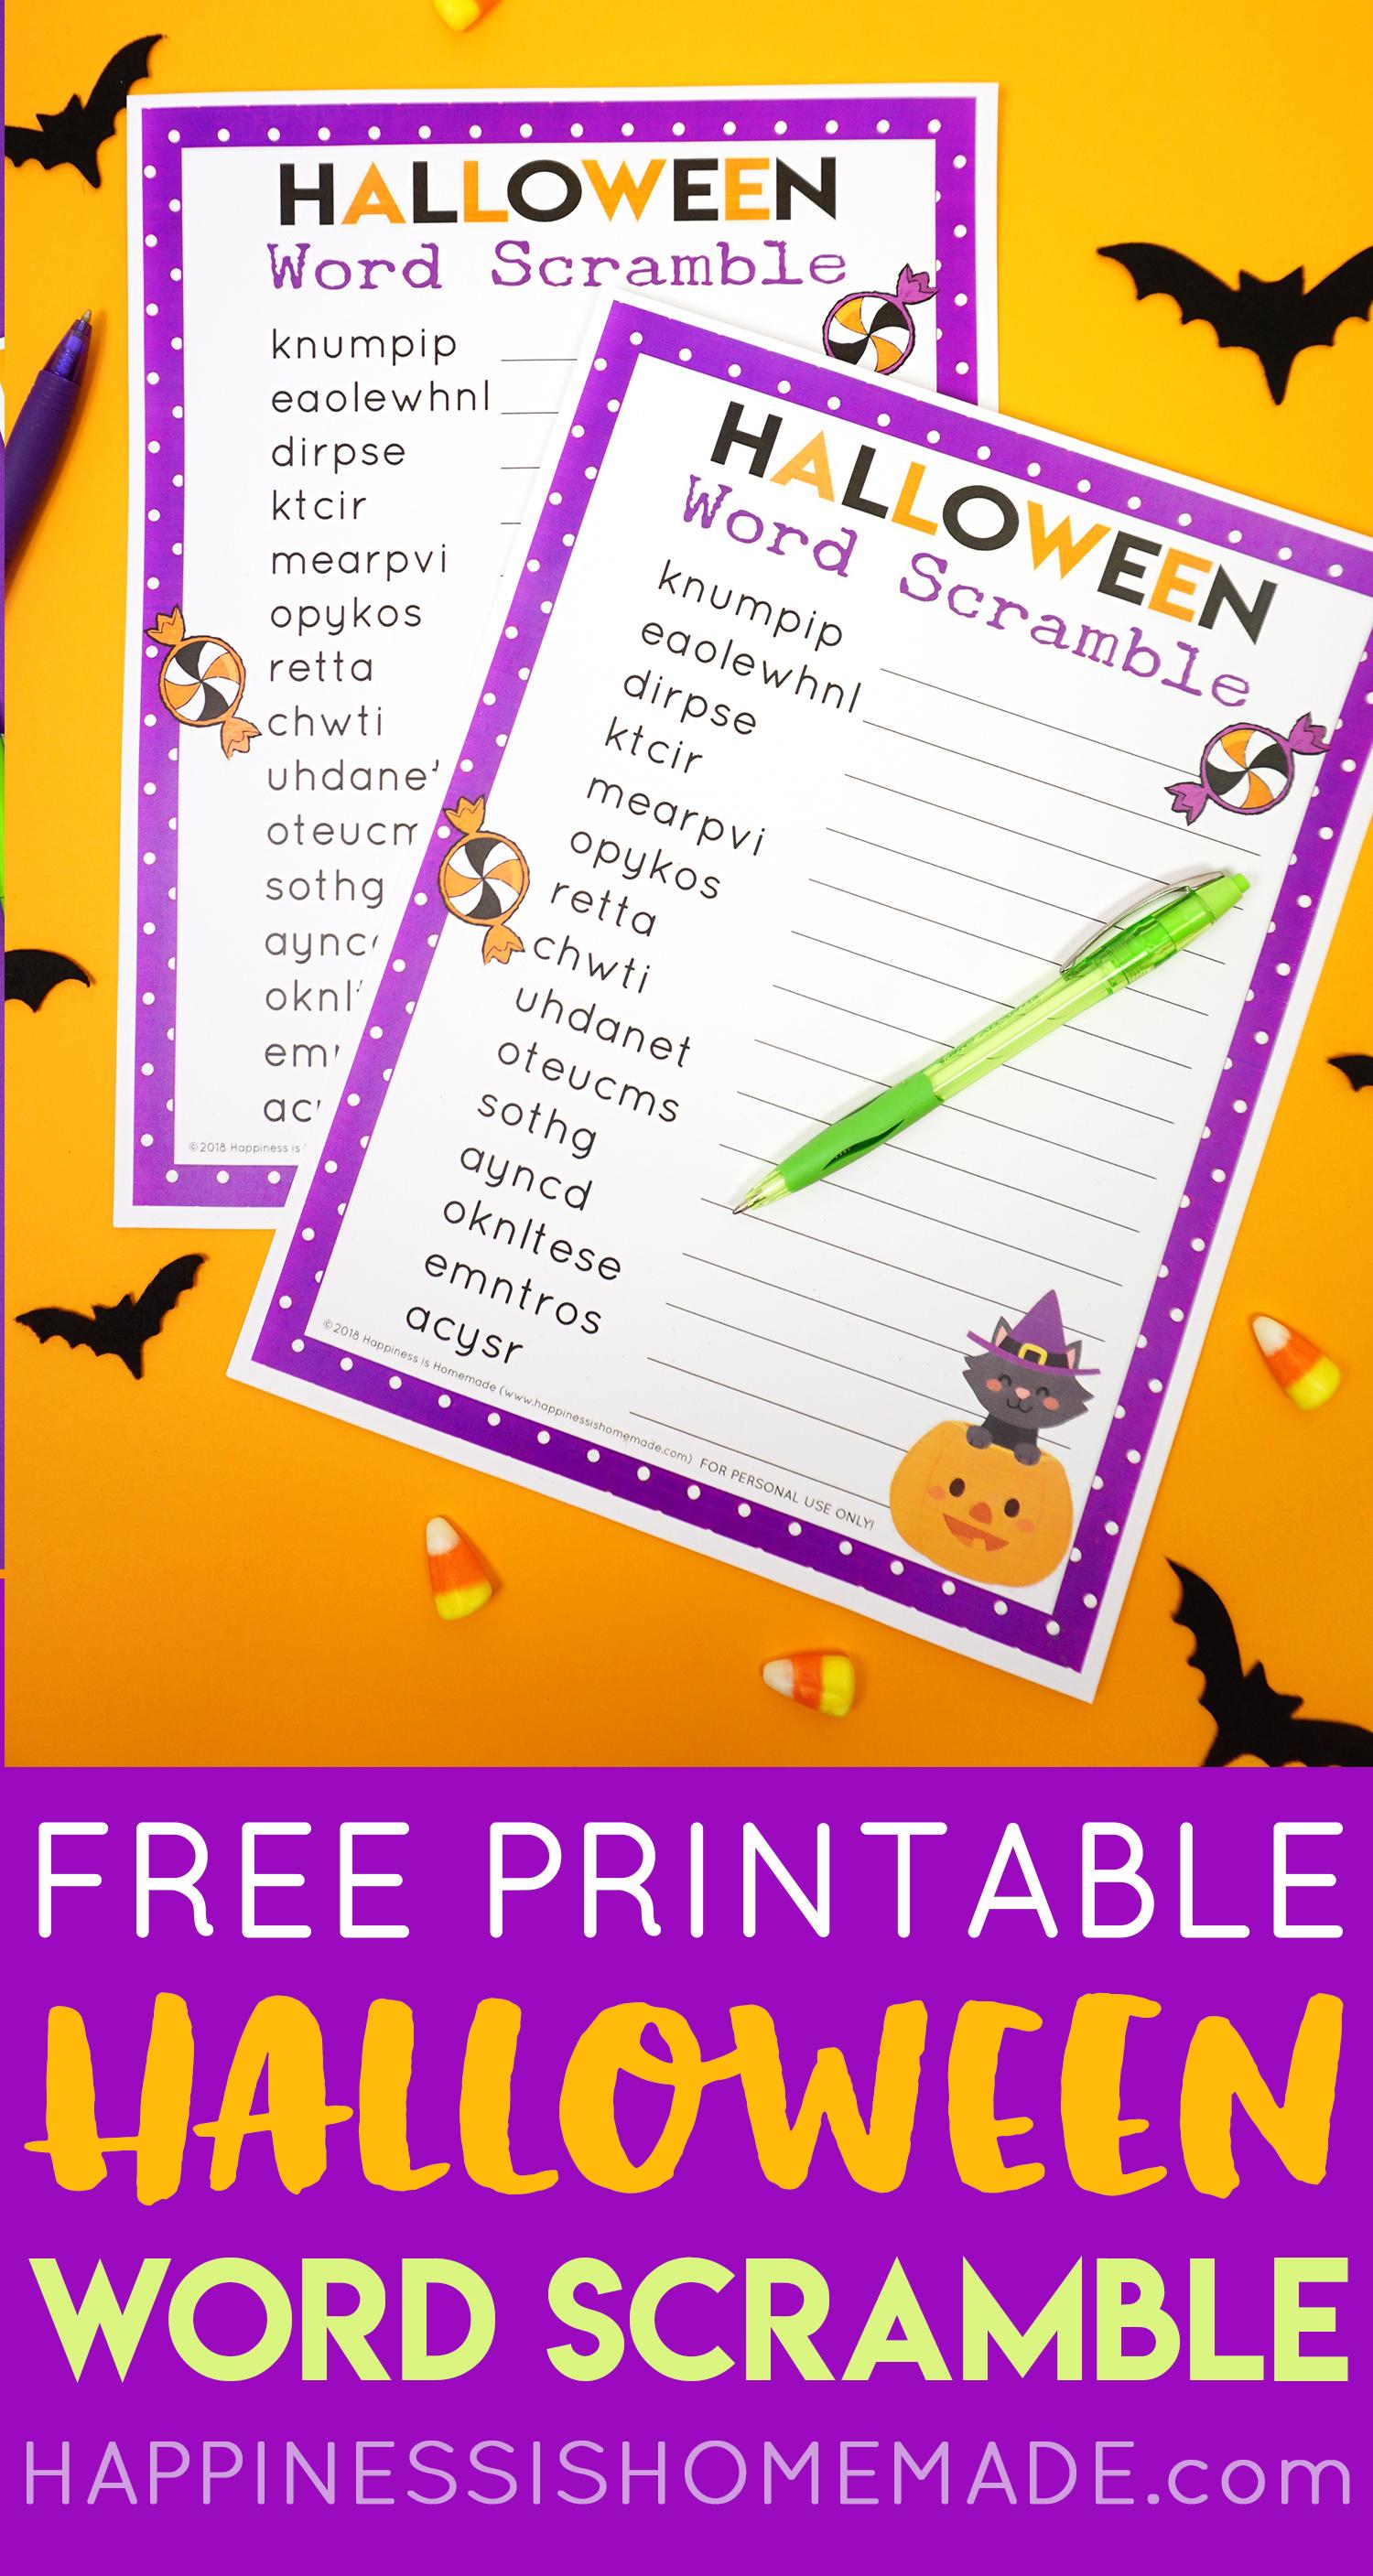 Halloween Word Scramble For Kids